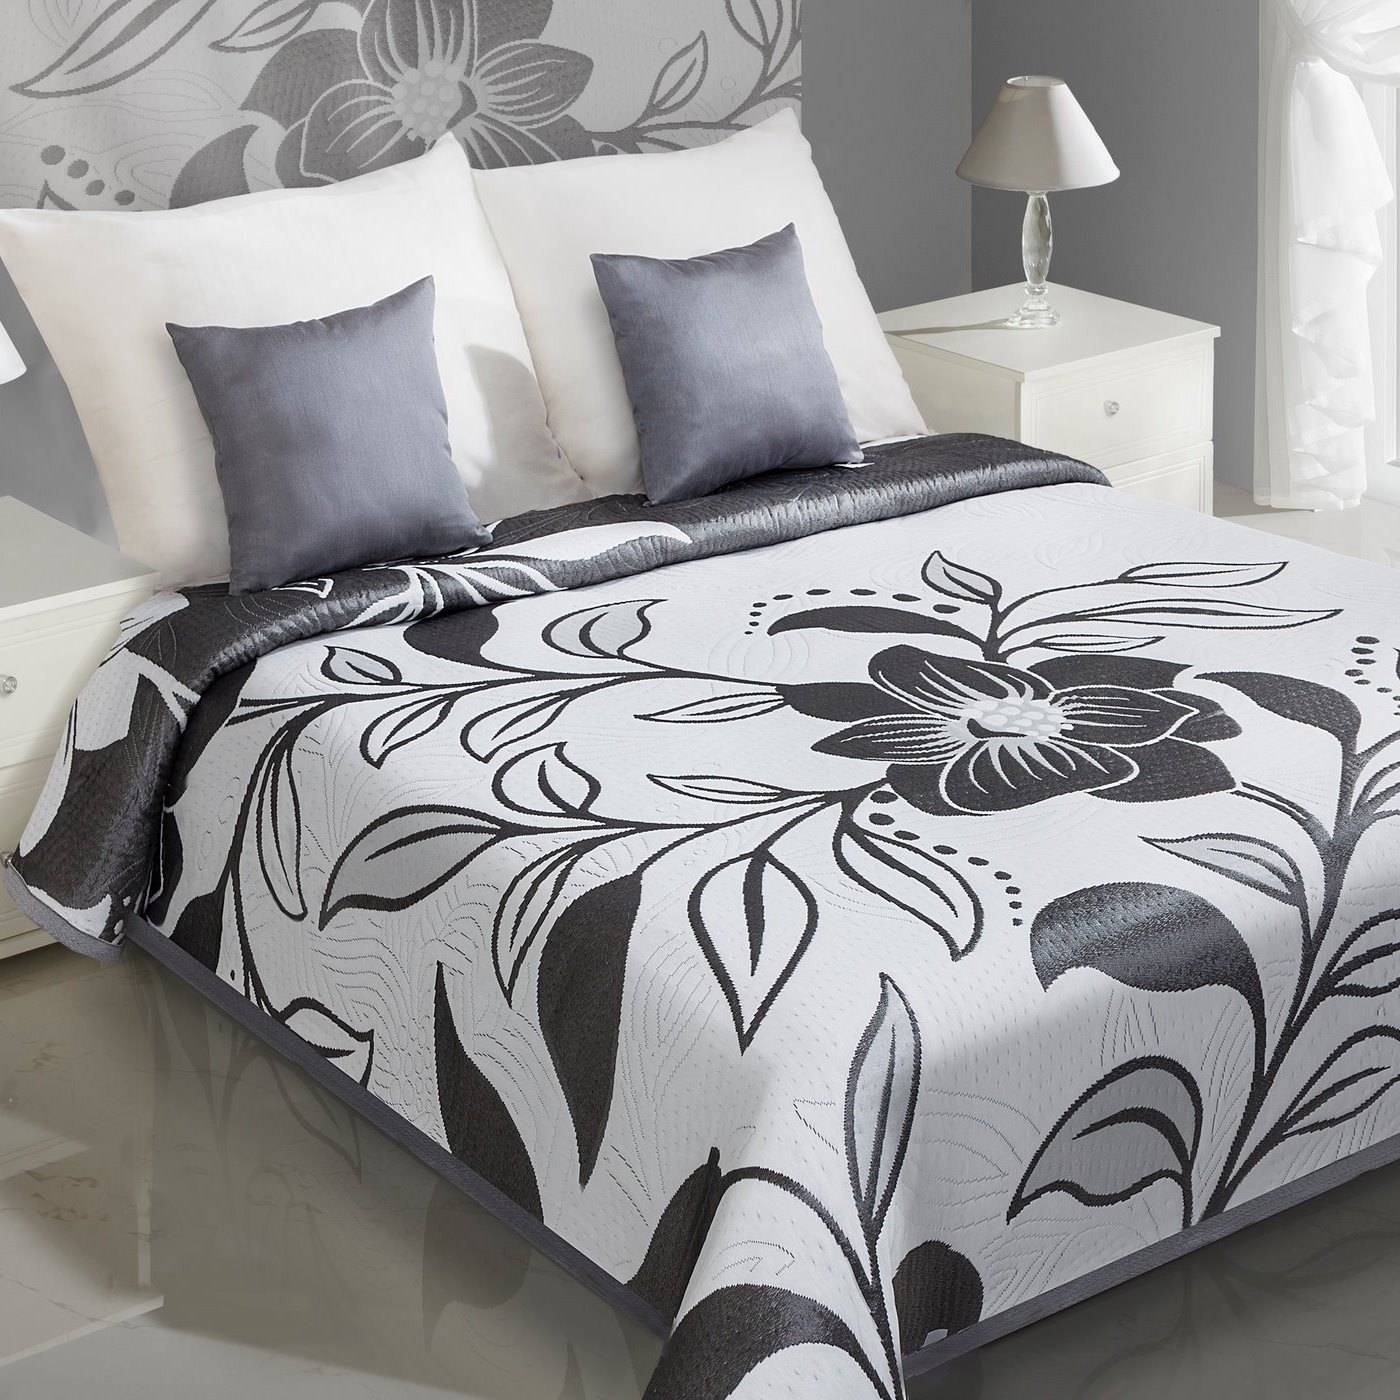 Cuvertura reversibila Lovetta White / Grey 170 x 210 cm